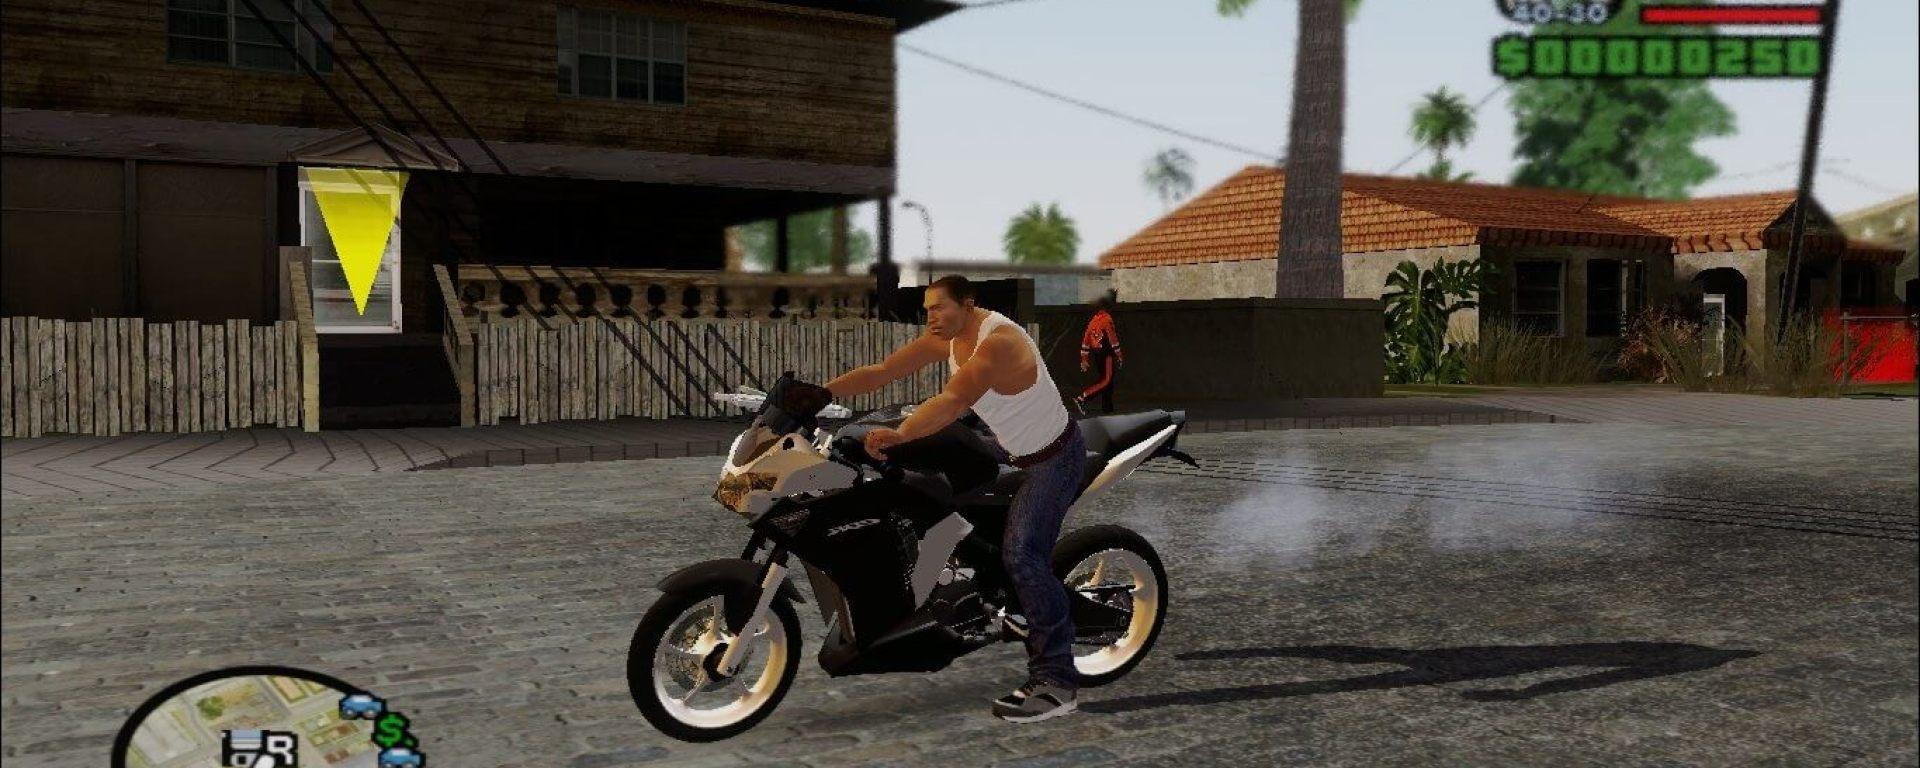 Athrva arora: gta san andreas pc game free download.